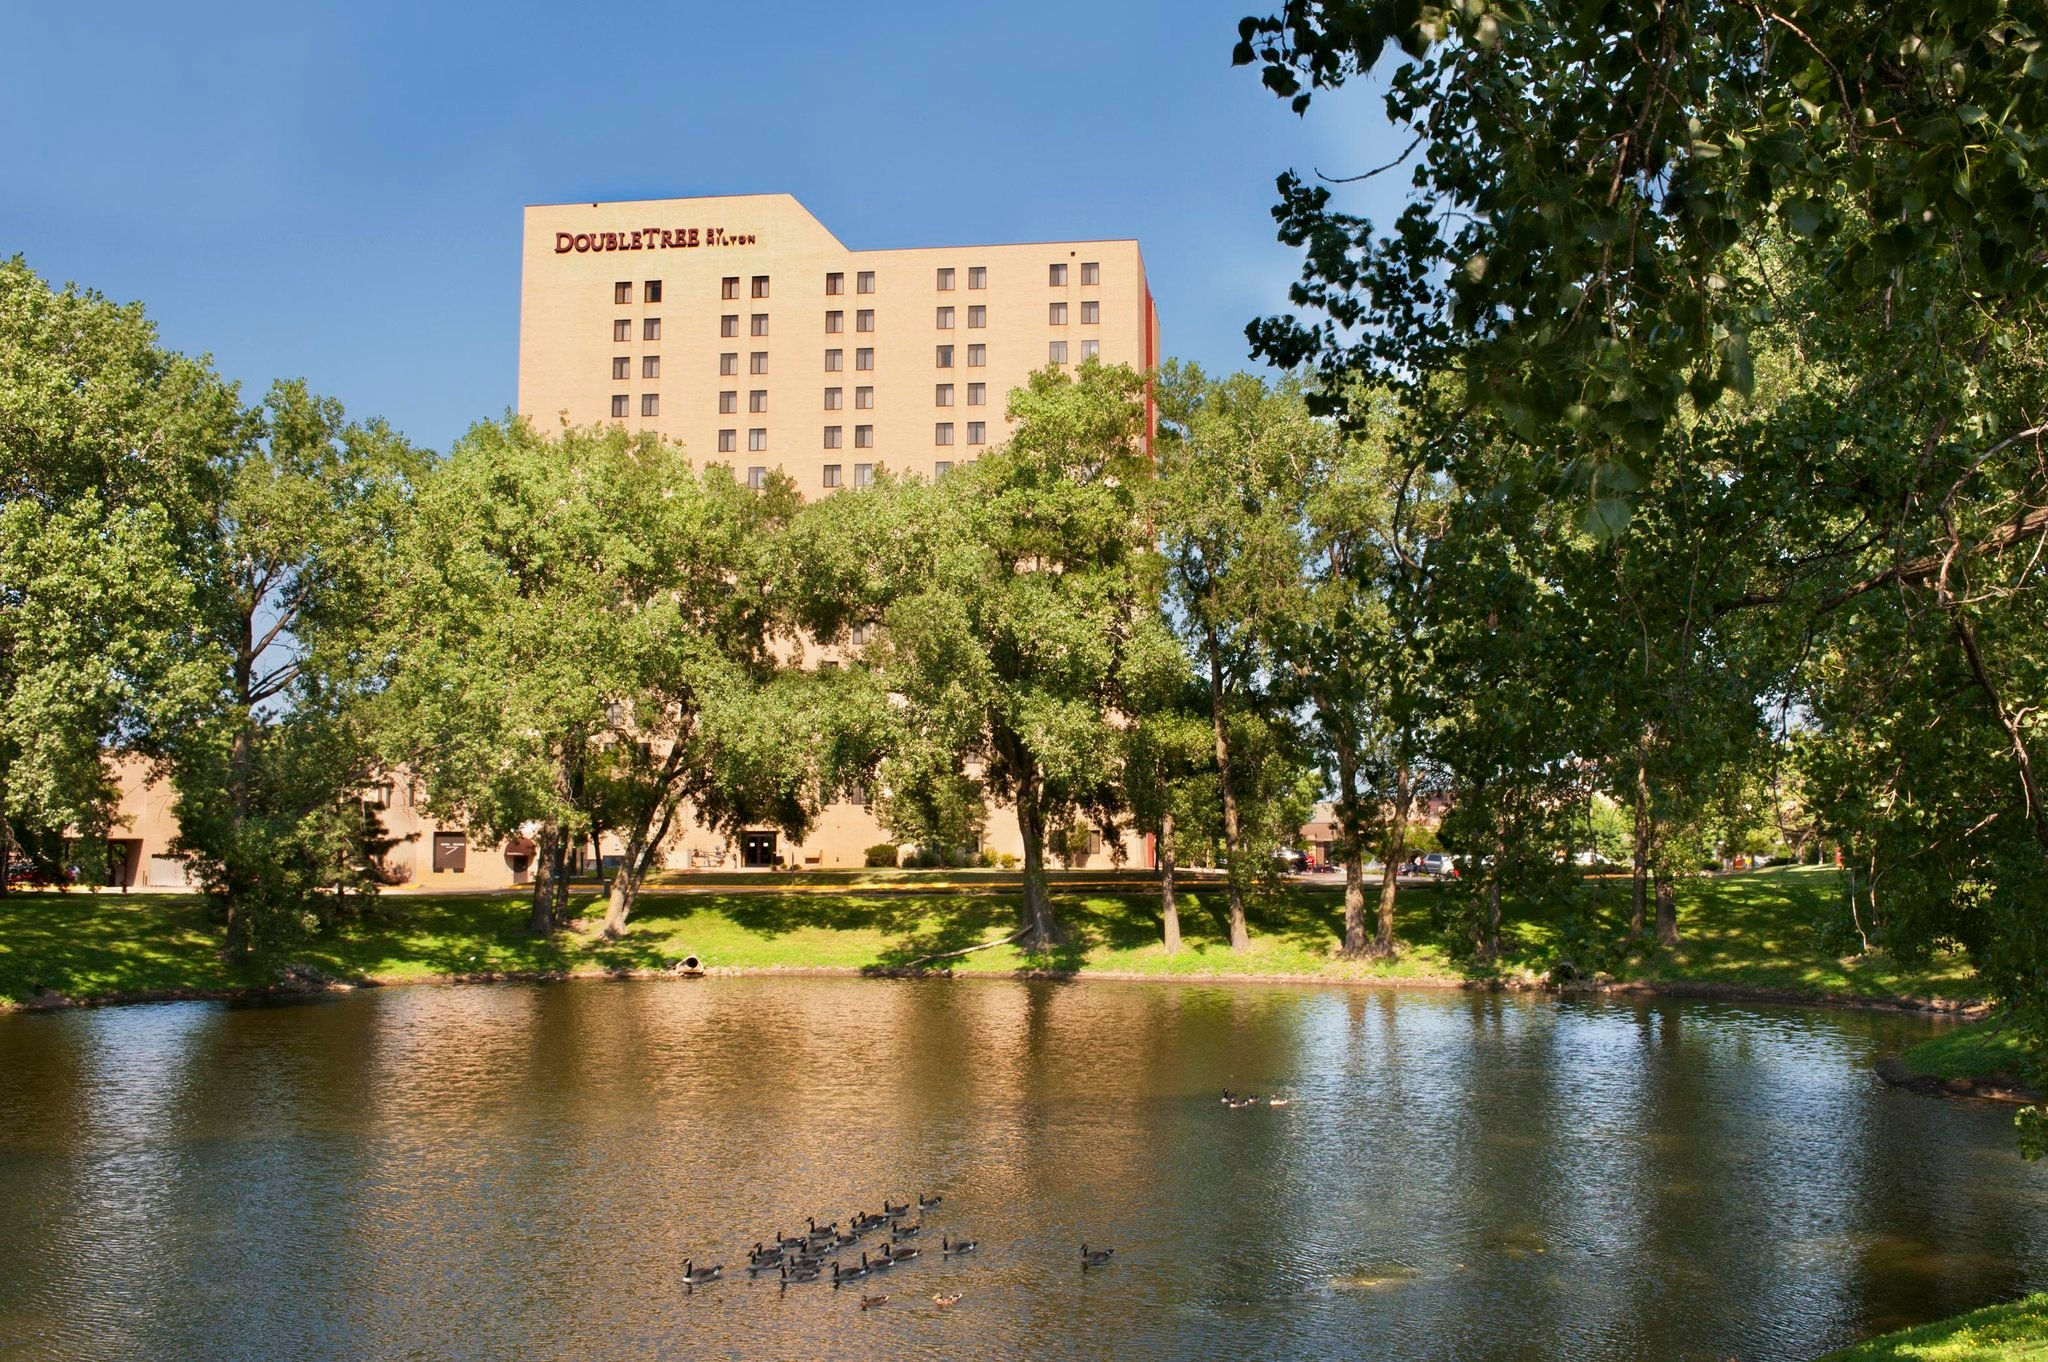 Doubletree by Hilton Minneapolis - Park Place